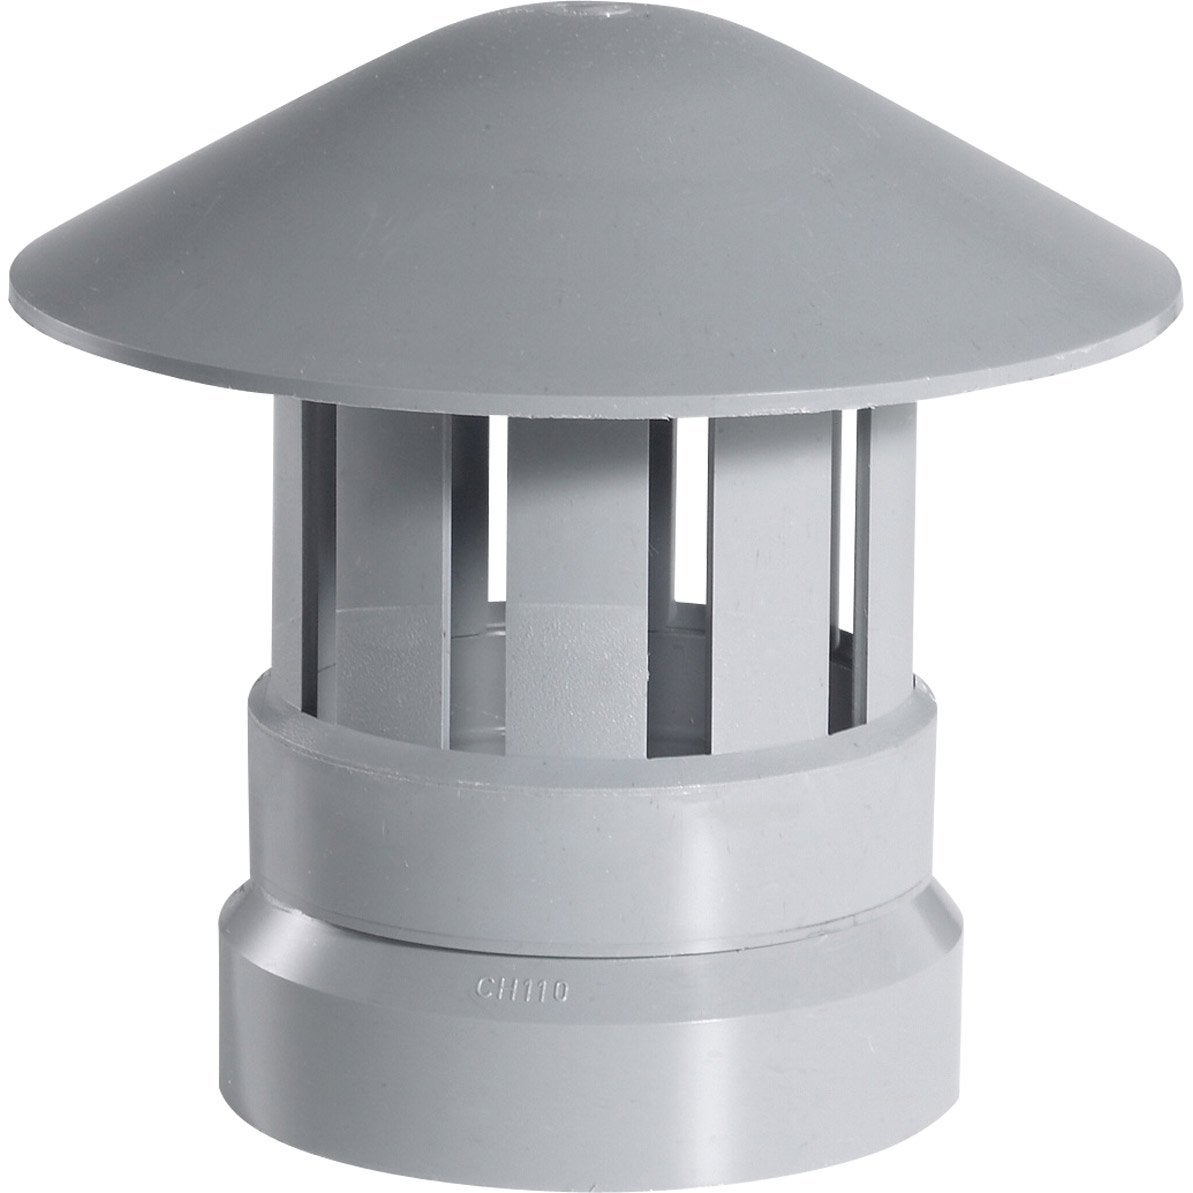 chapeau de ventilation pvc girpi gris diam 110 mm leroy merlin. Black Bedroom Furniture Sets. Home Design Ideas